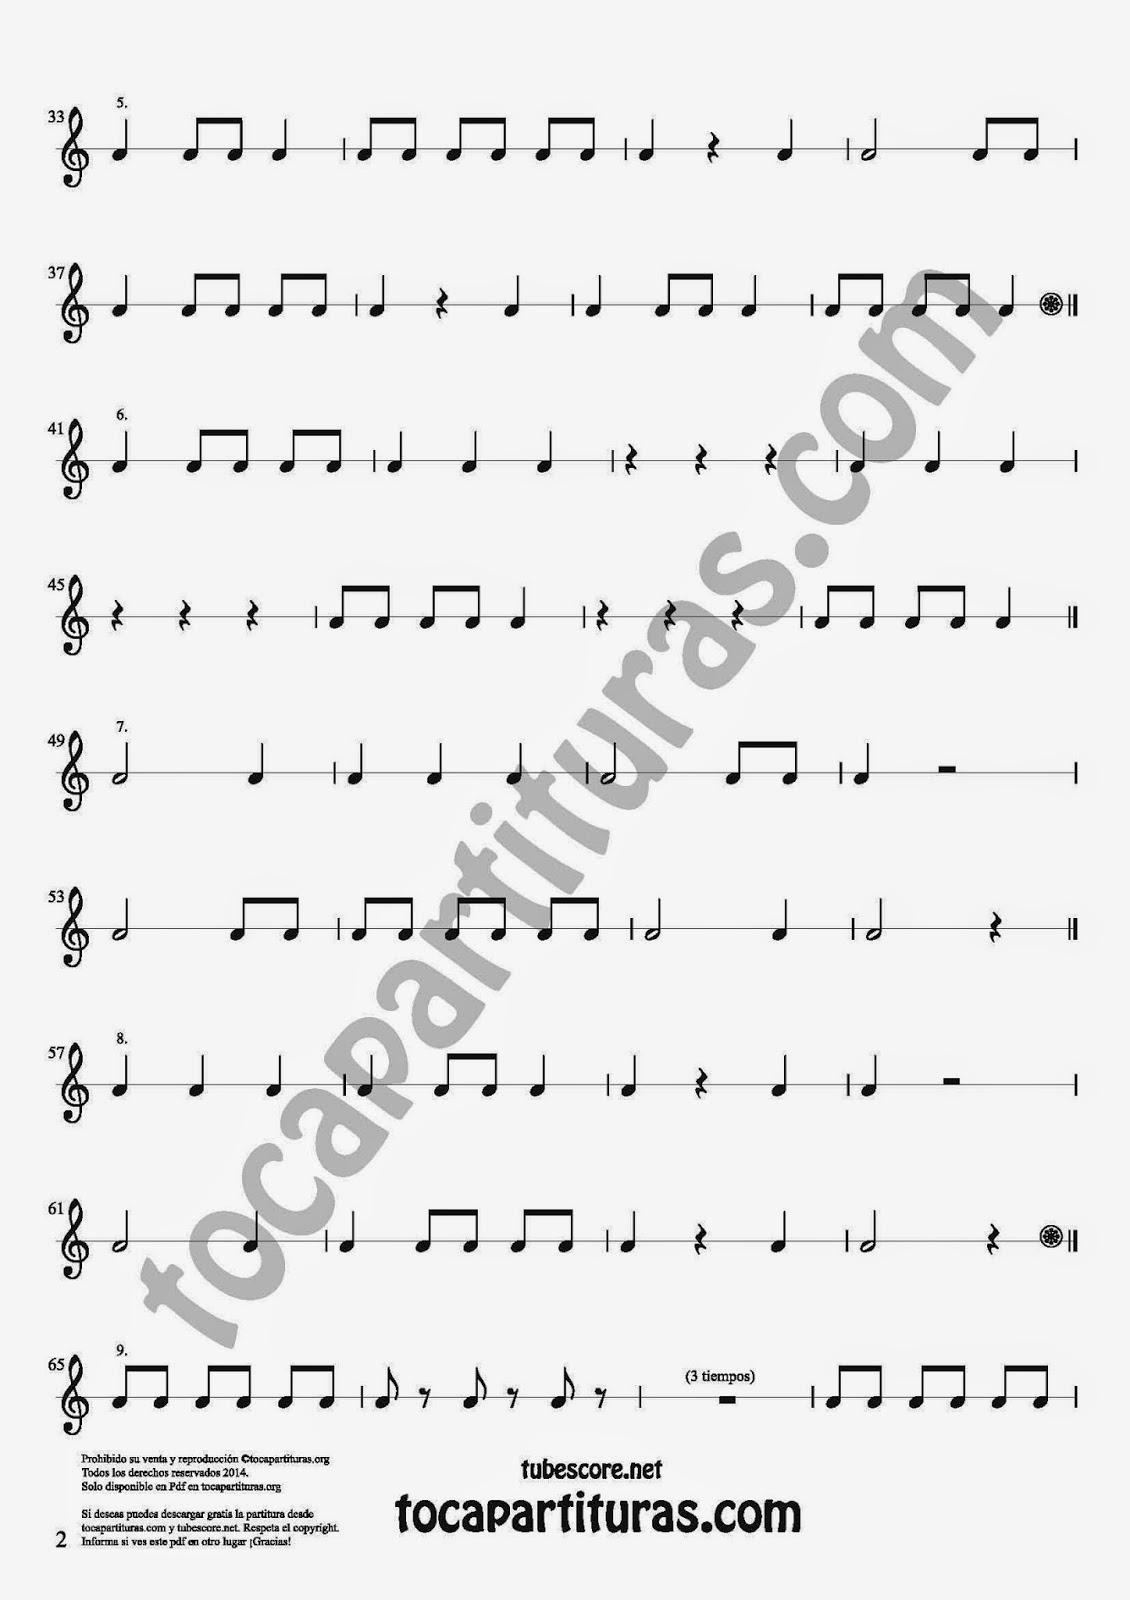 Ejercicios Ritmicos Para Guitarra 2 17 Ejercicios Rítmicos Para